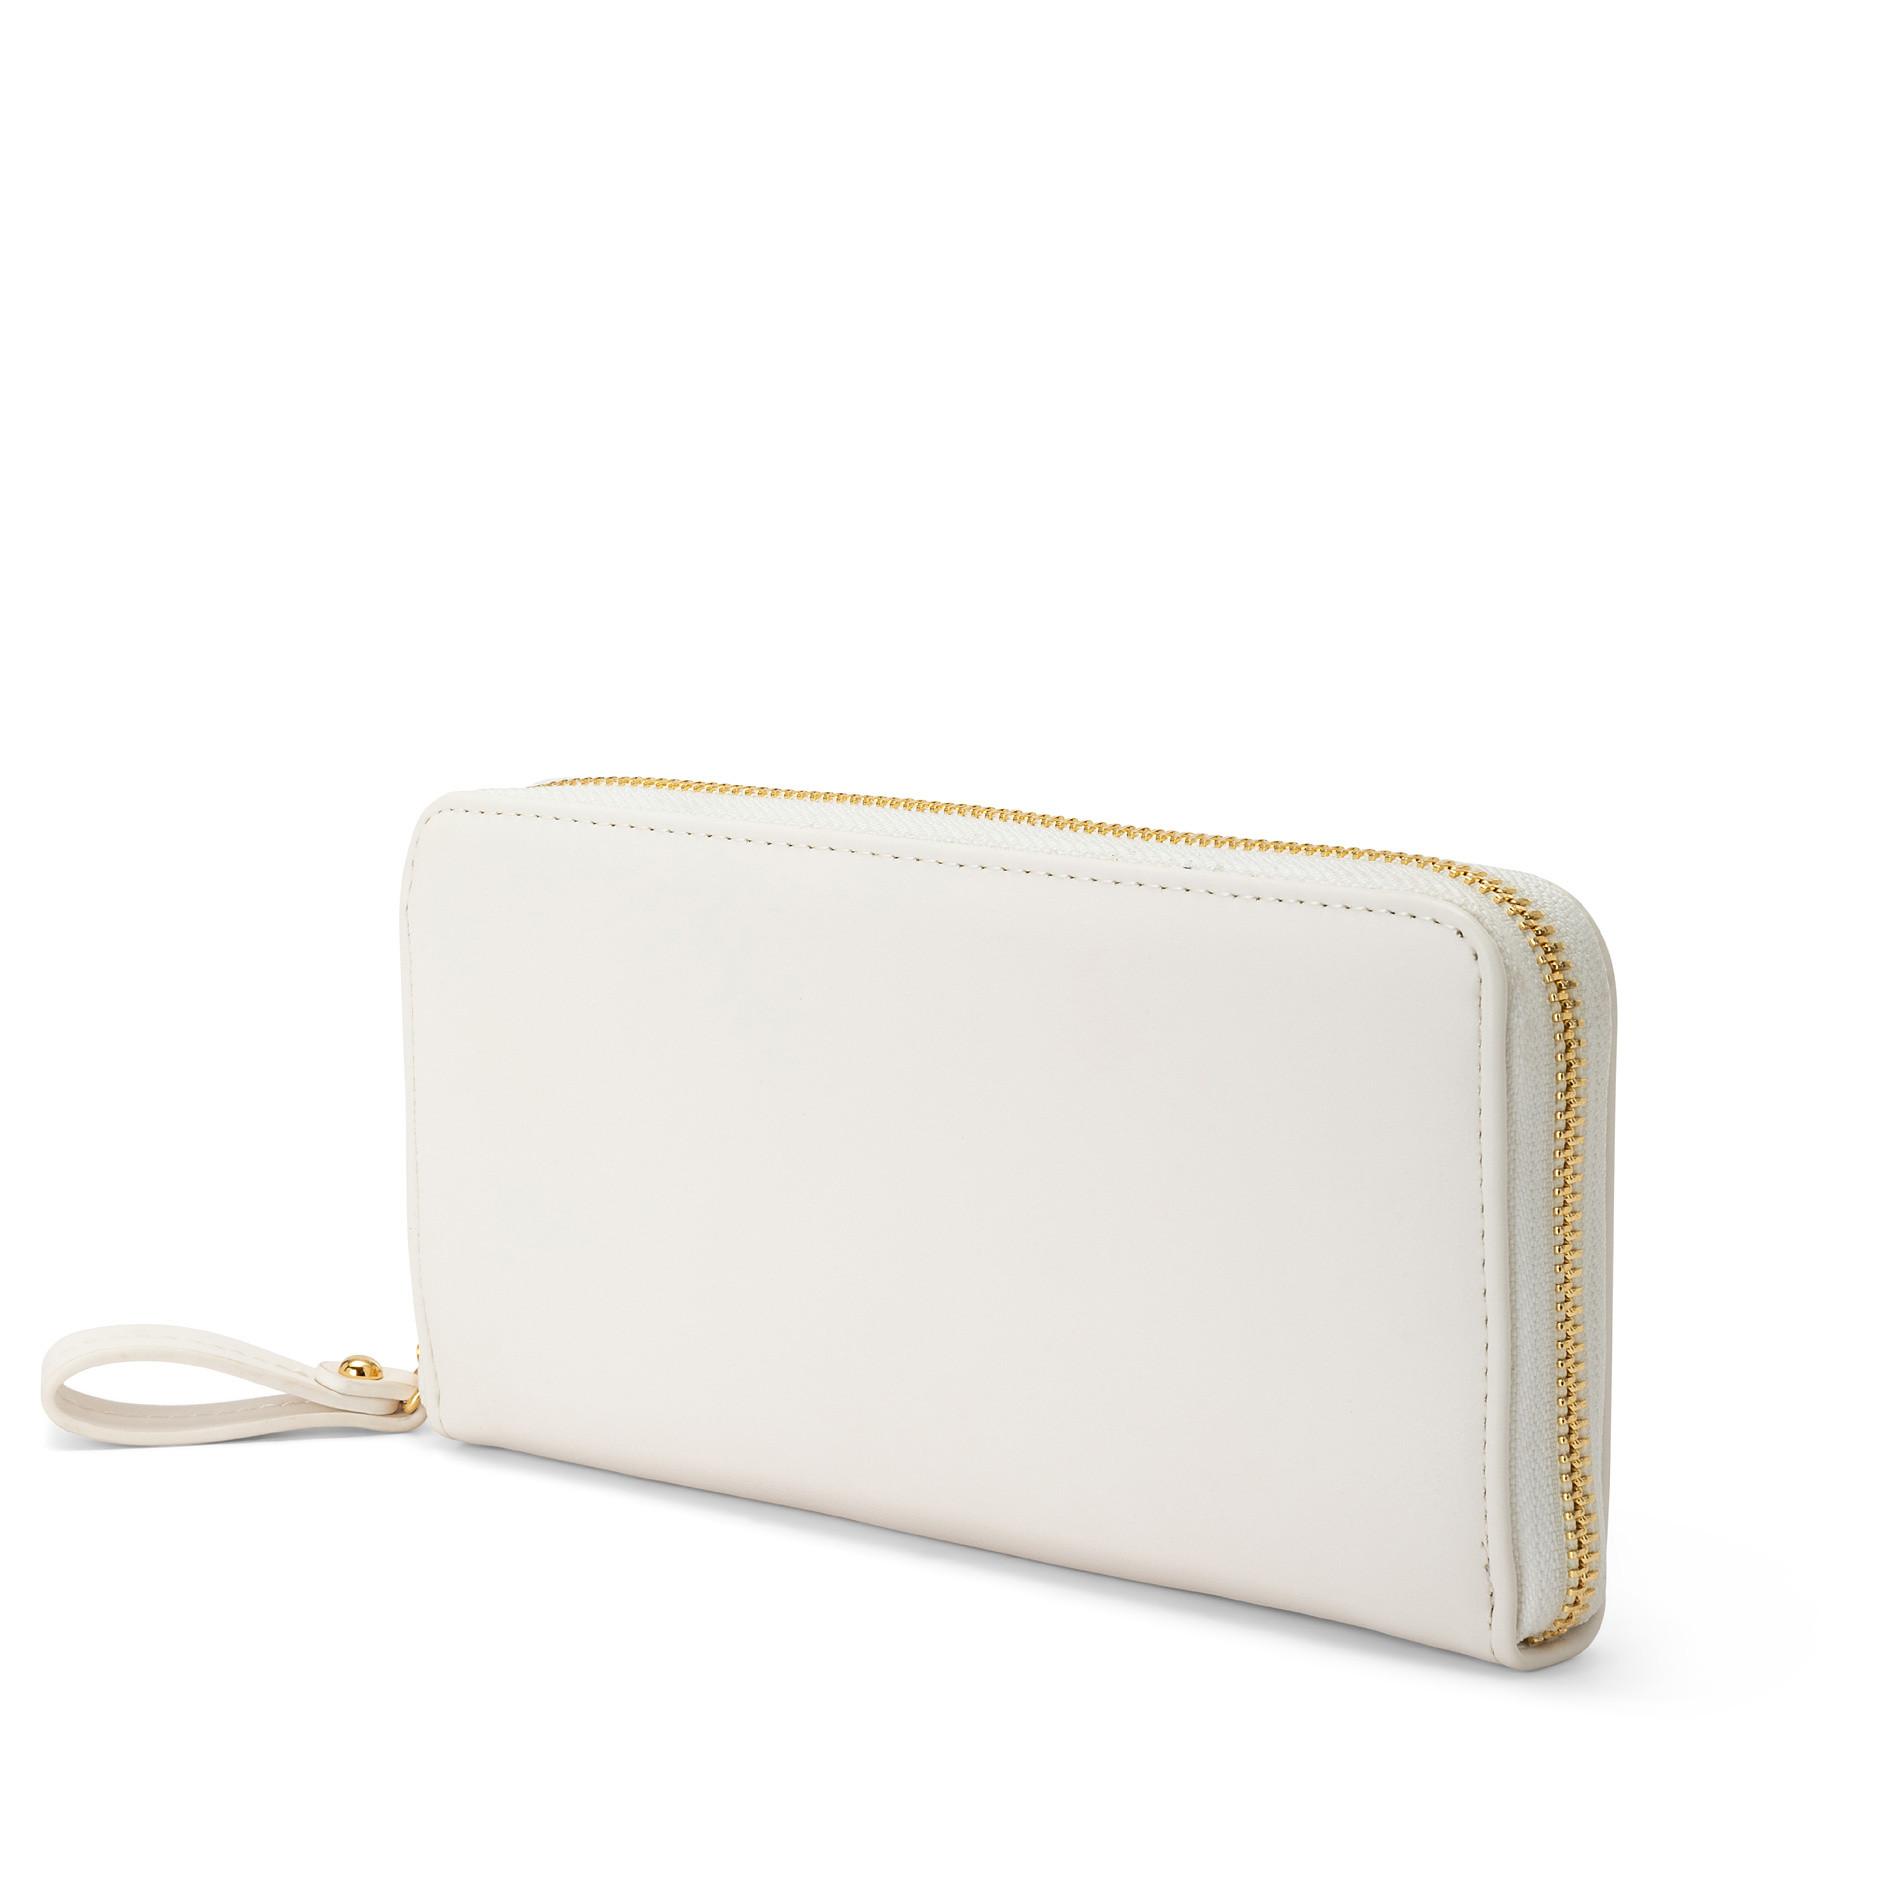 Portafoglio pelle sintetica Koan, Bianco, large image number 1